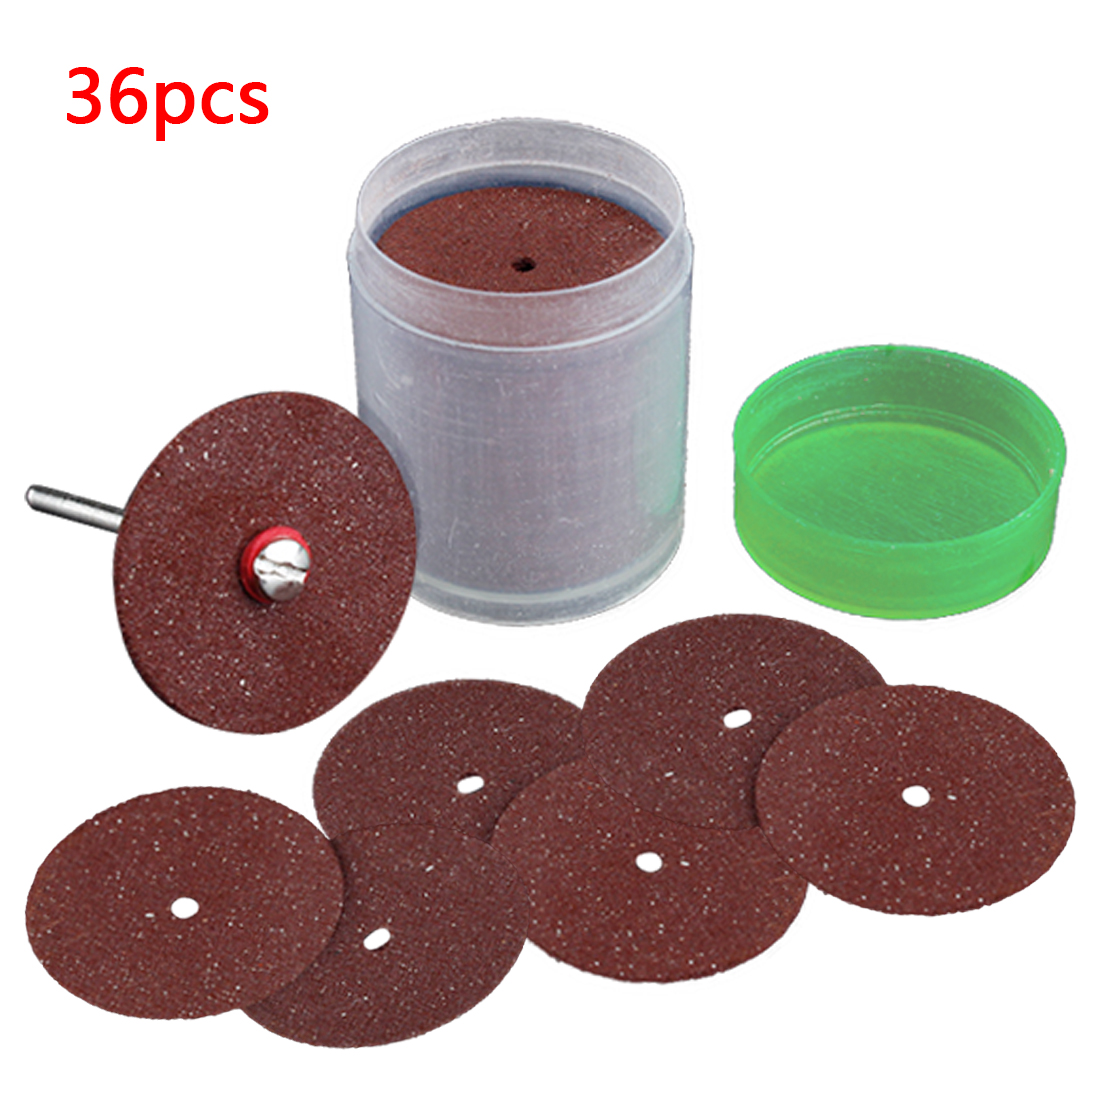 36pcs Cutting Disc Circular Saw Blade Grinding Wheel For Dremel Rotary Tool Abrasive Sanding Disc Tools Cutting Wood Metal